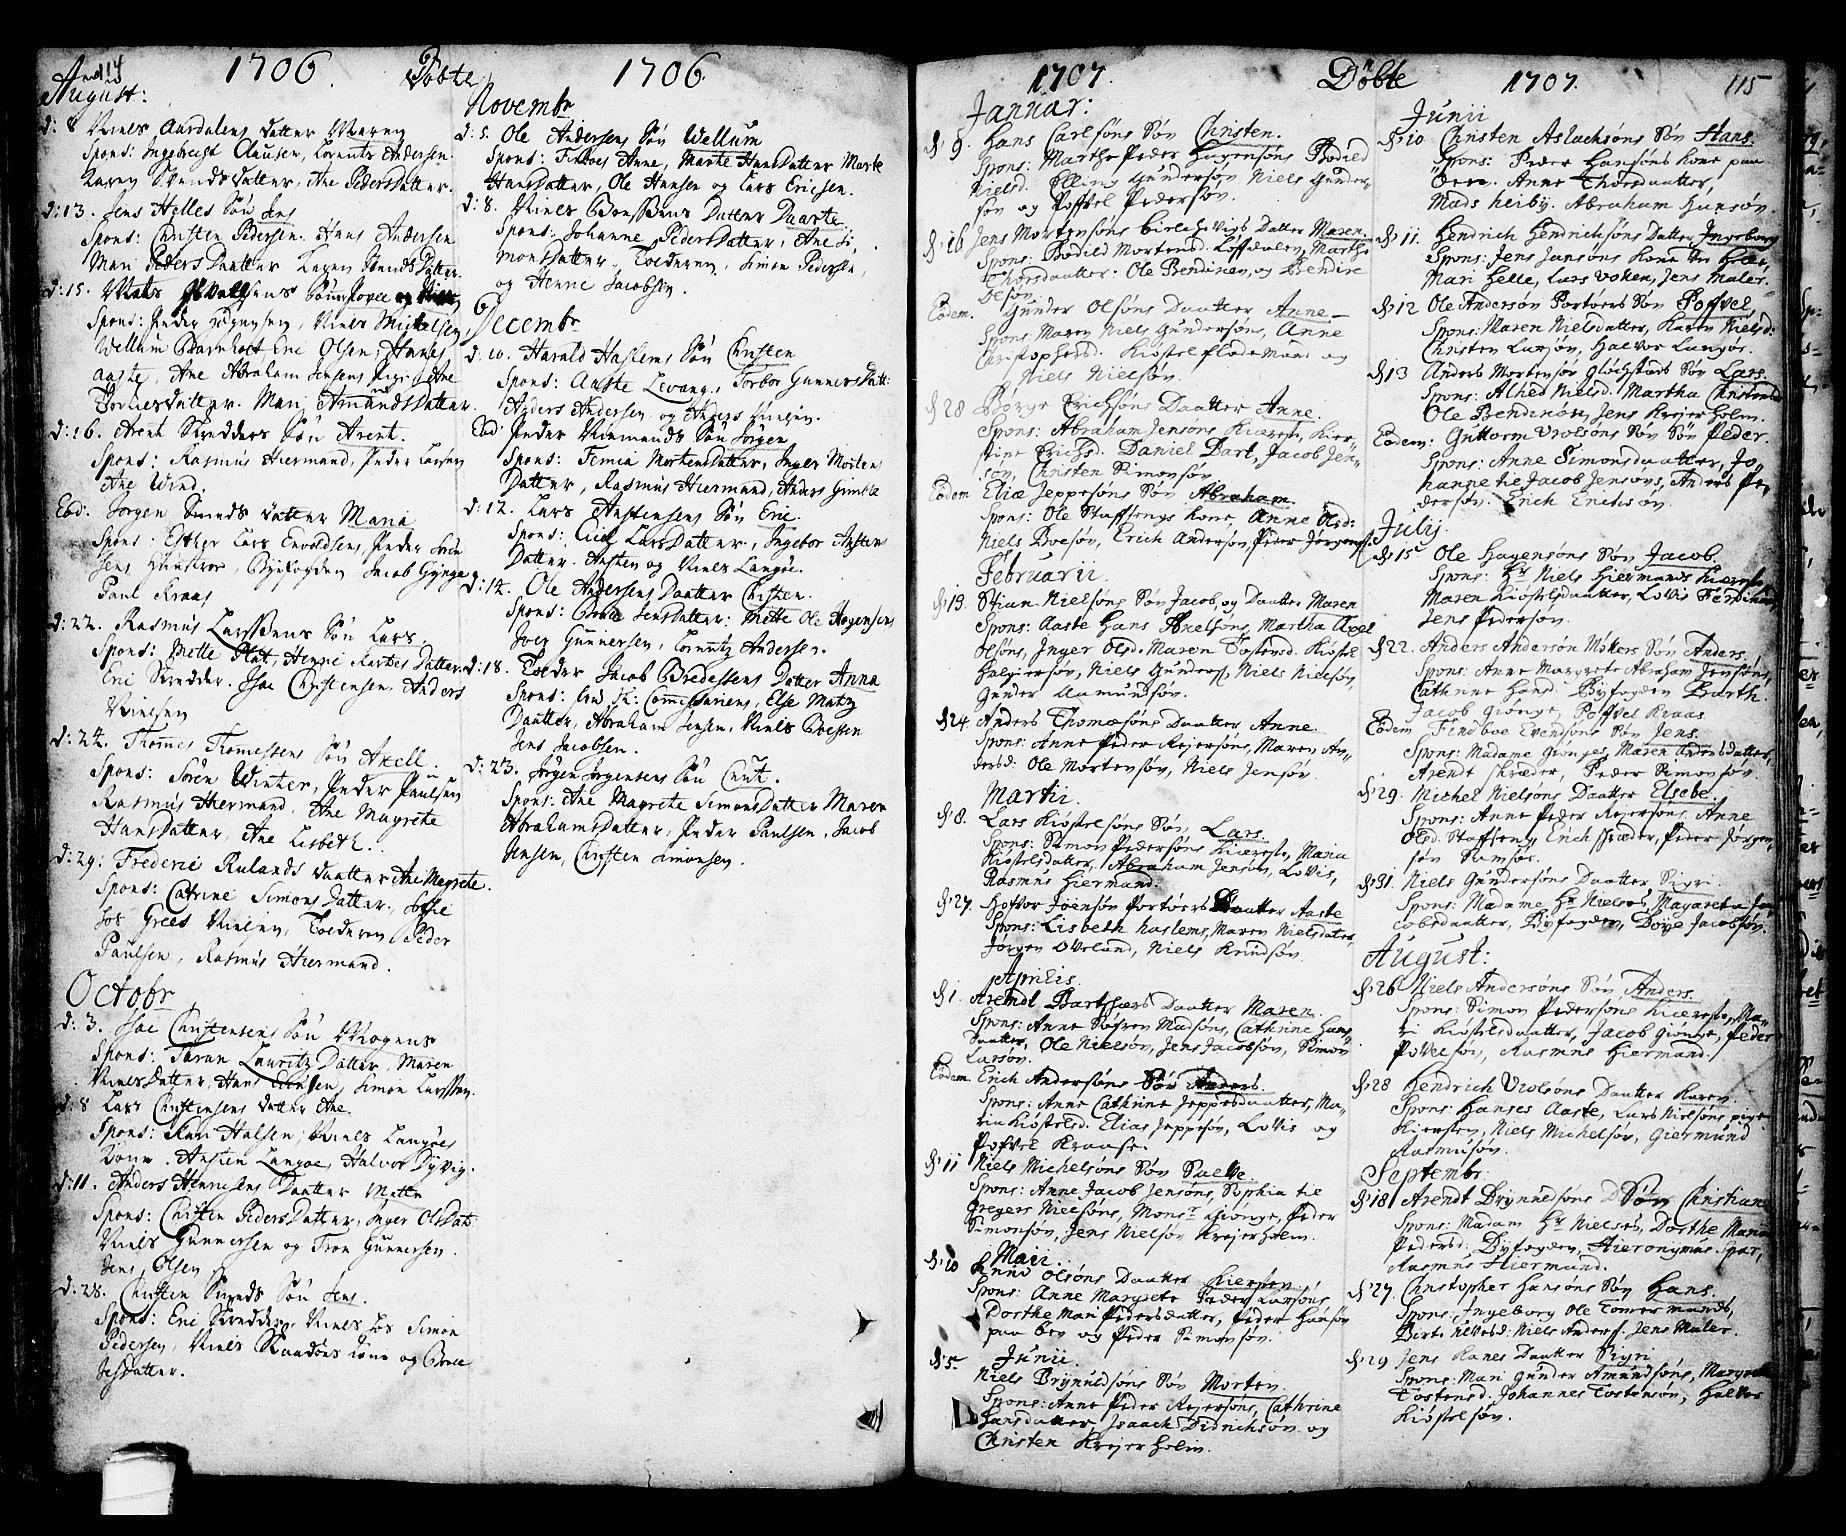 SAKO, Kragerø kirkebøker, F/Fa/L0001: Ministerialbok nr. 1, 1702-1766, s. 114-115